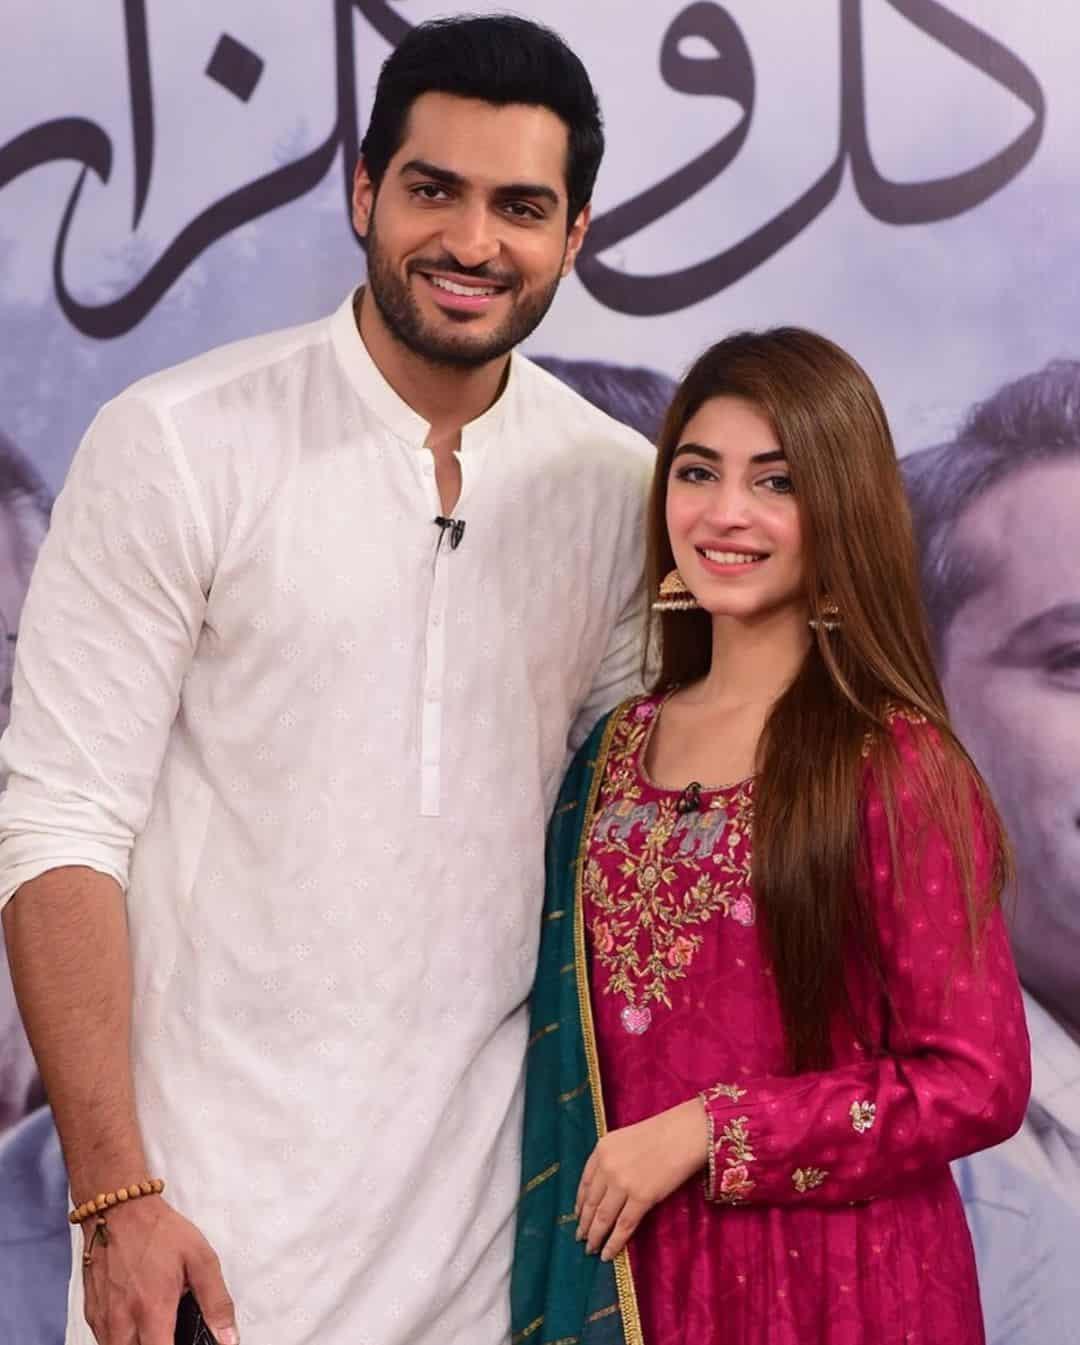 Cast of Drama Serial Gul-o-Gulzar in Good Morning Pakistan